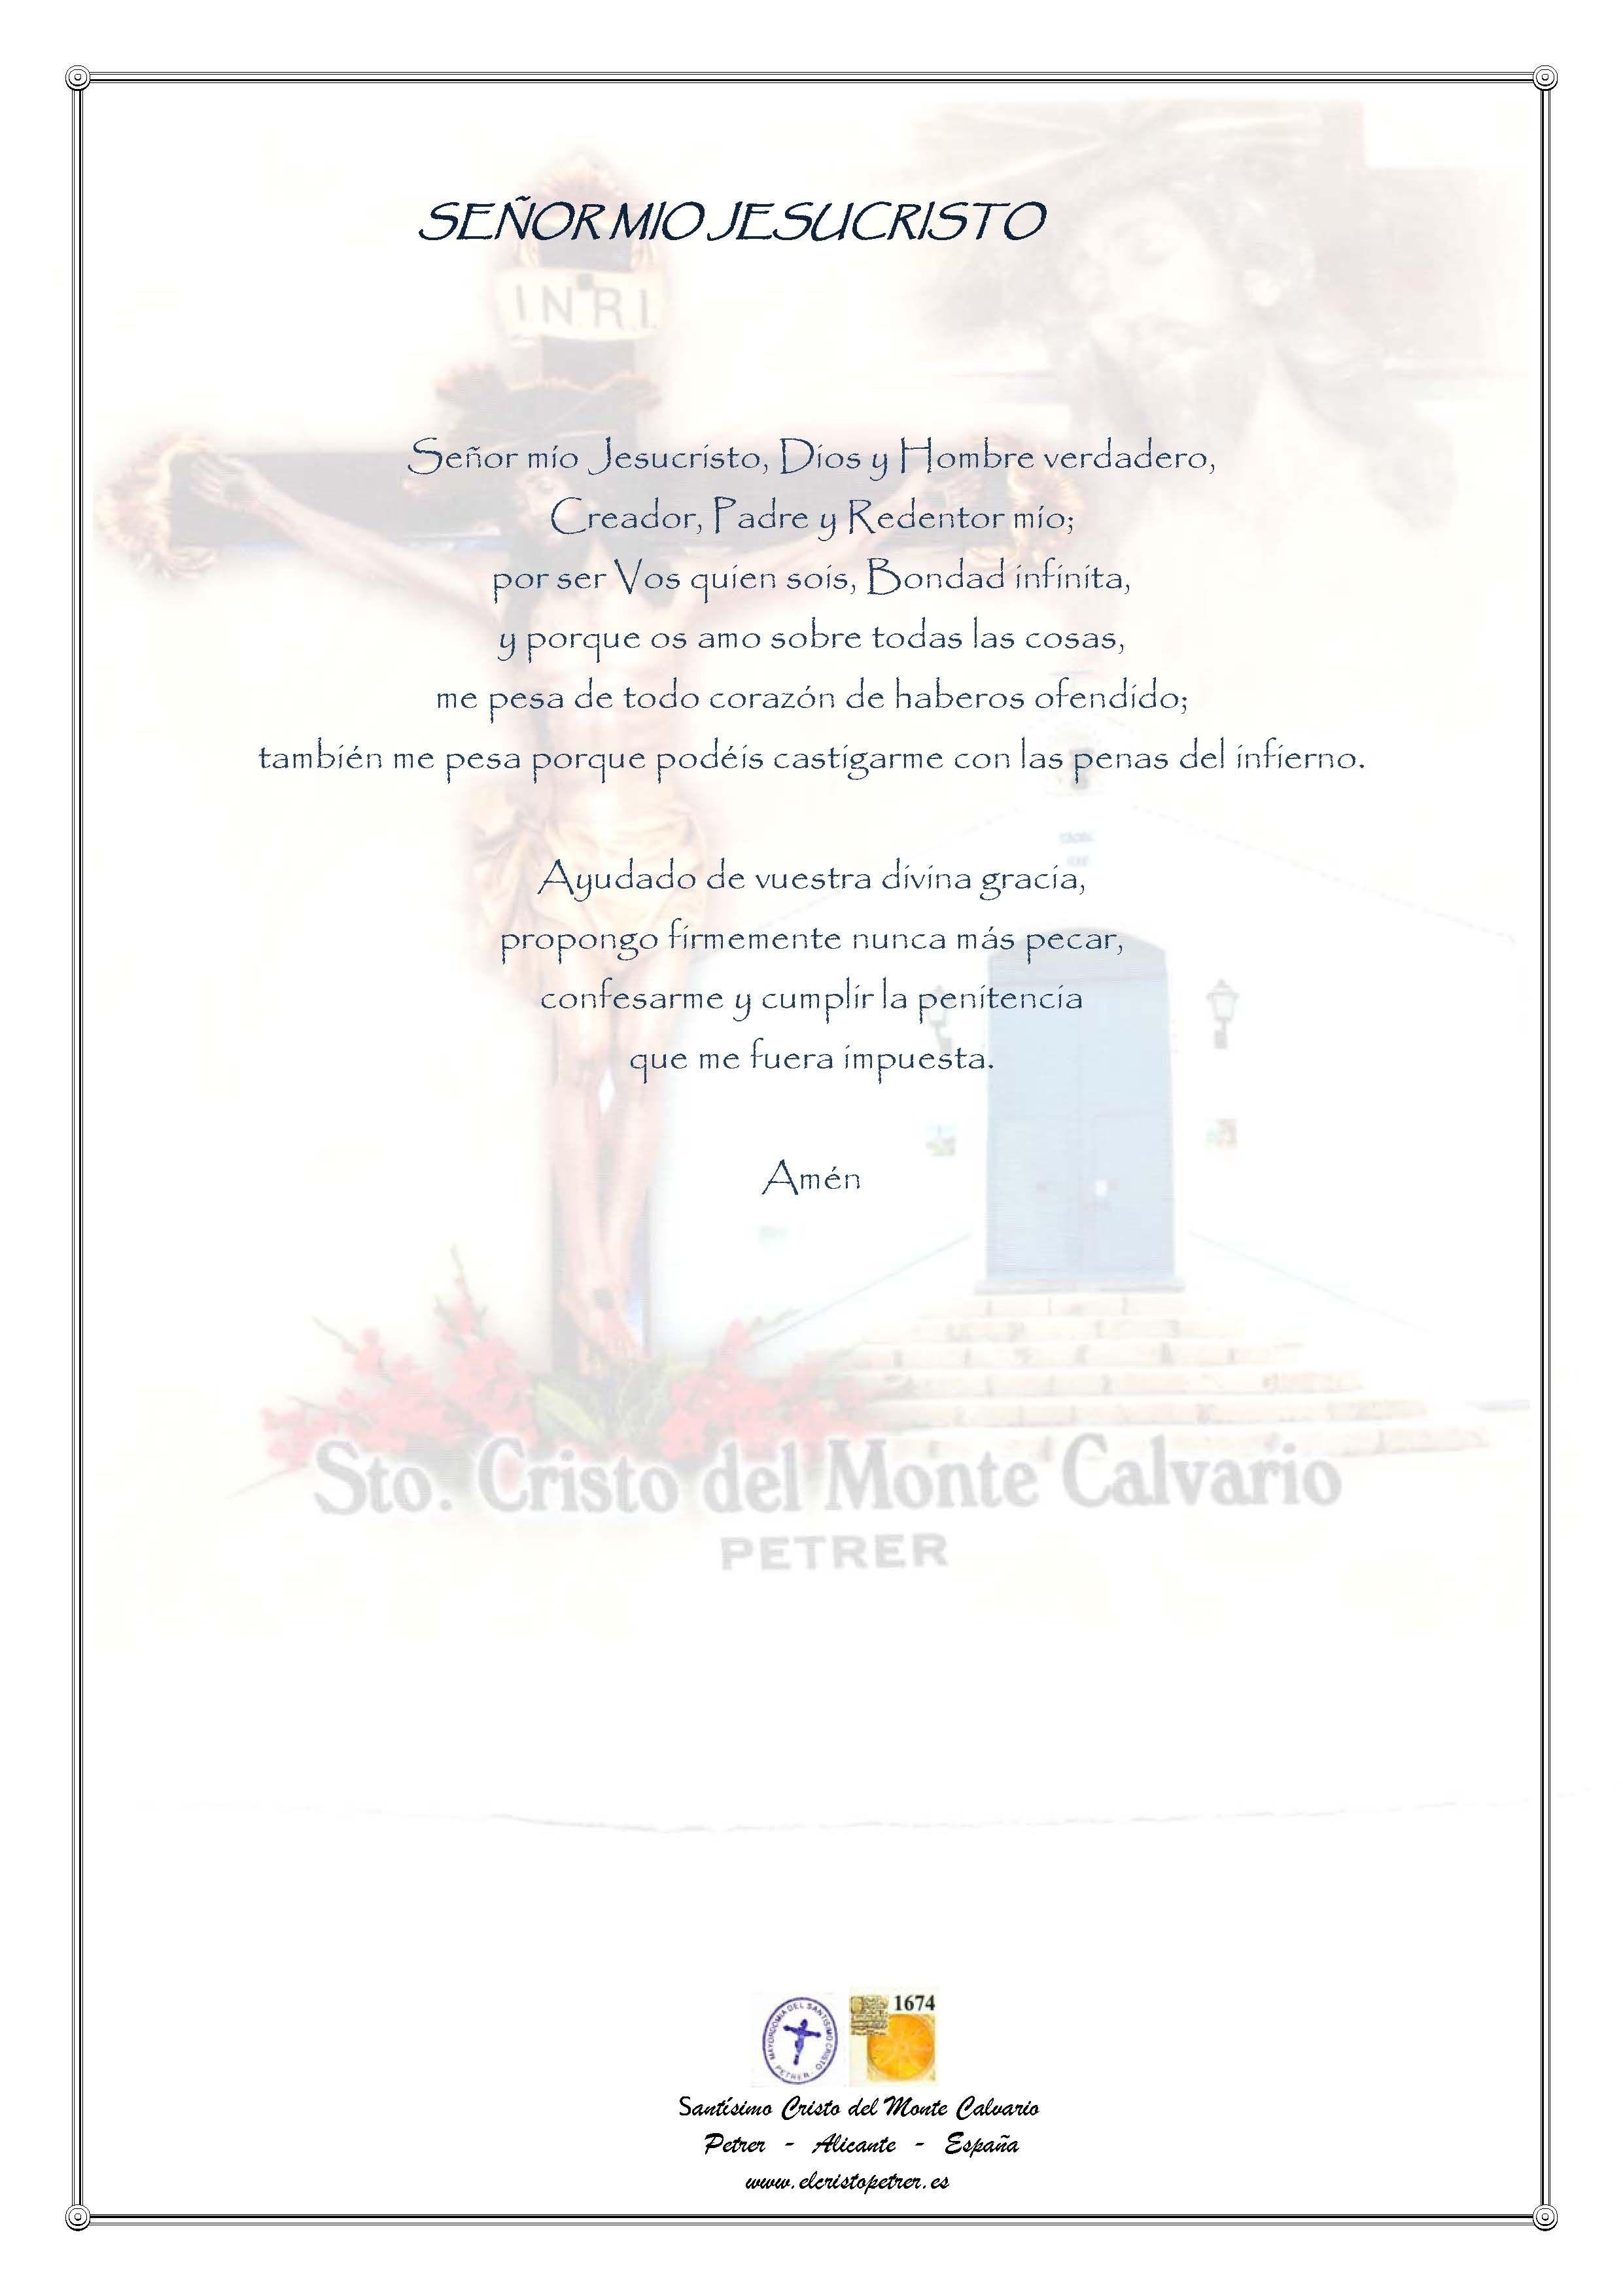 ElCristo - Oraciones - Iglesia - Iglesia - Señor Mio Jesucristo